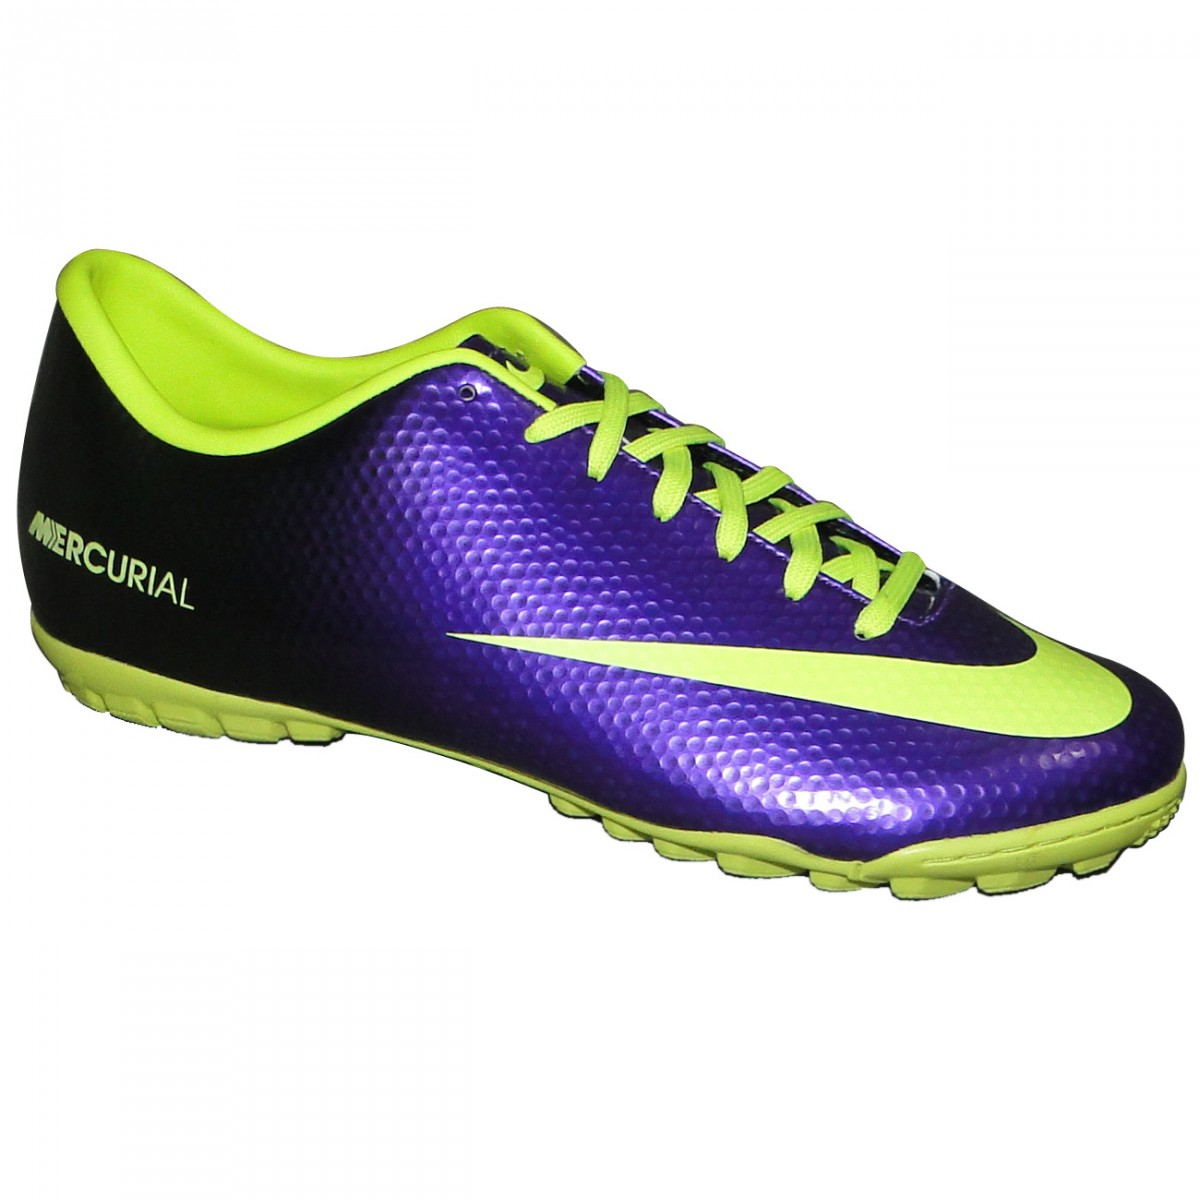 4af4b7d5384b1 Chuteira Society Nike Mercurial Victory IV 558561 570 - Roxo Limão - Chuteira  Nike